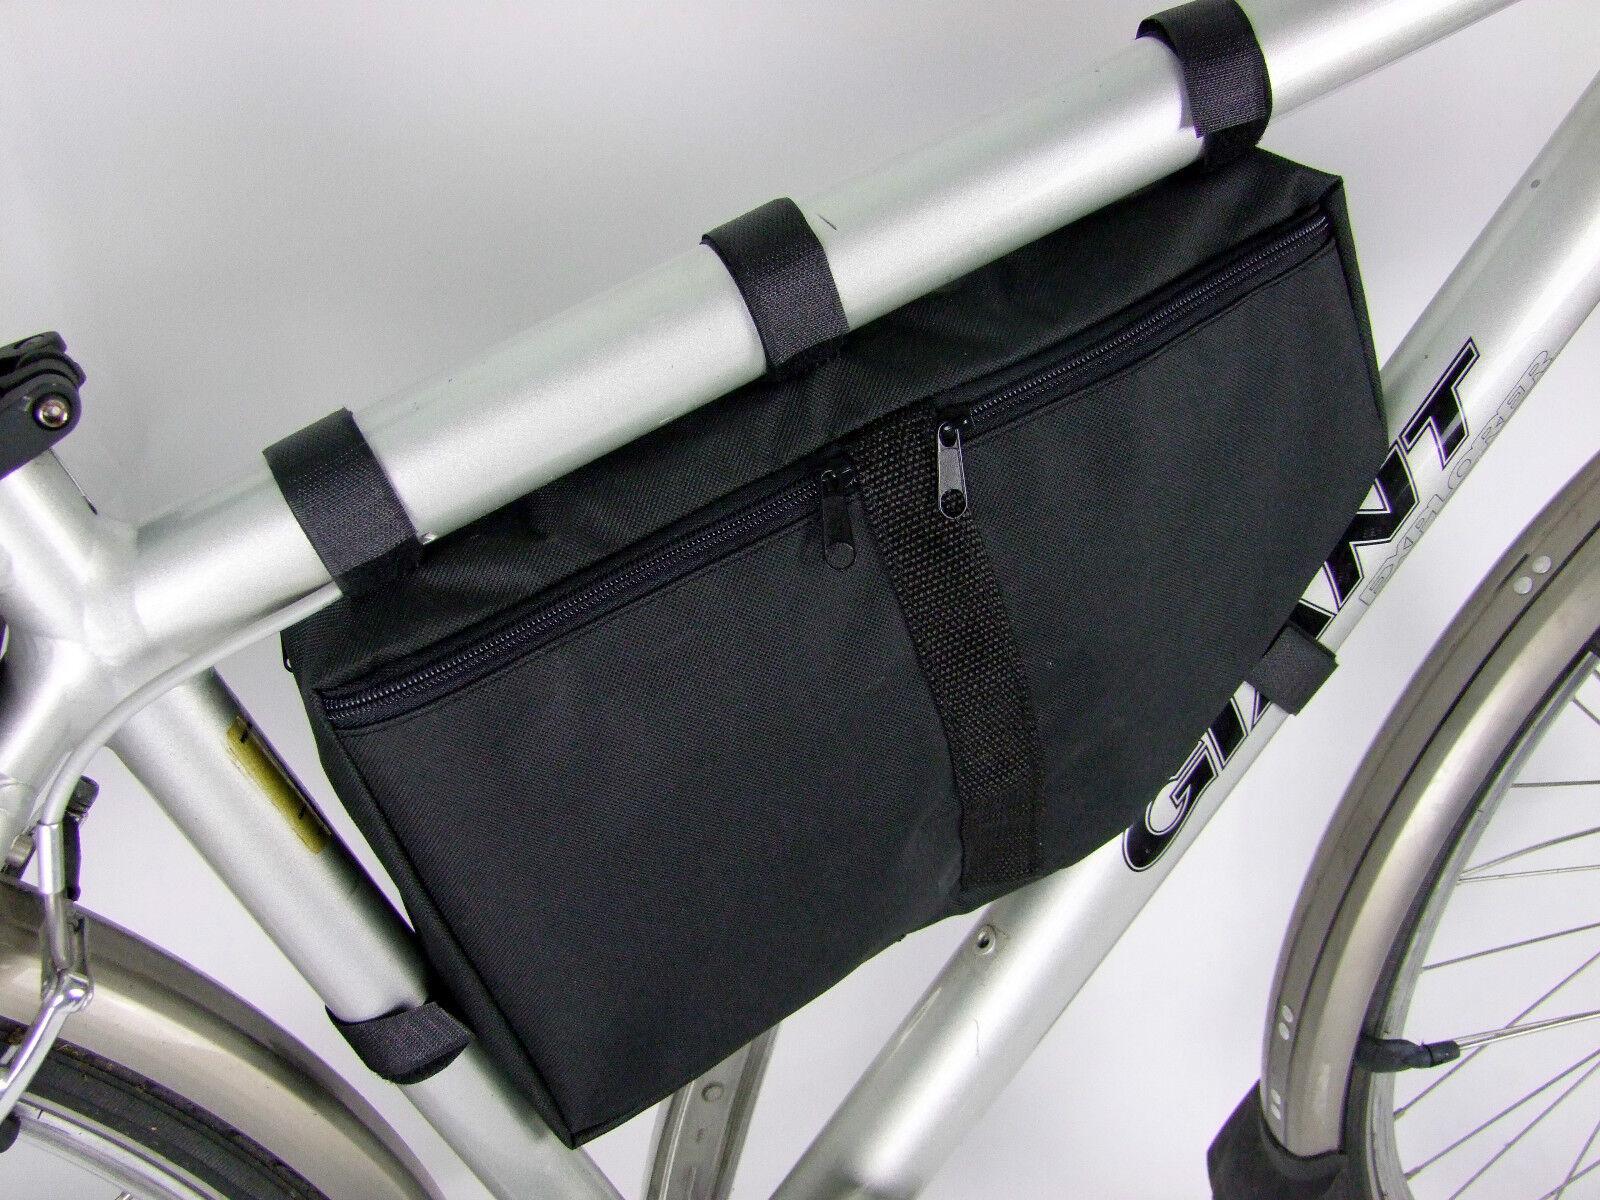 fahrrad bmx rahmentasche fahrradtasche sch ne gro e tasche. Black Bedroom Furniture Sets. Home Design Ideas